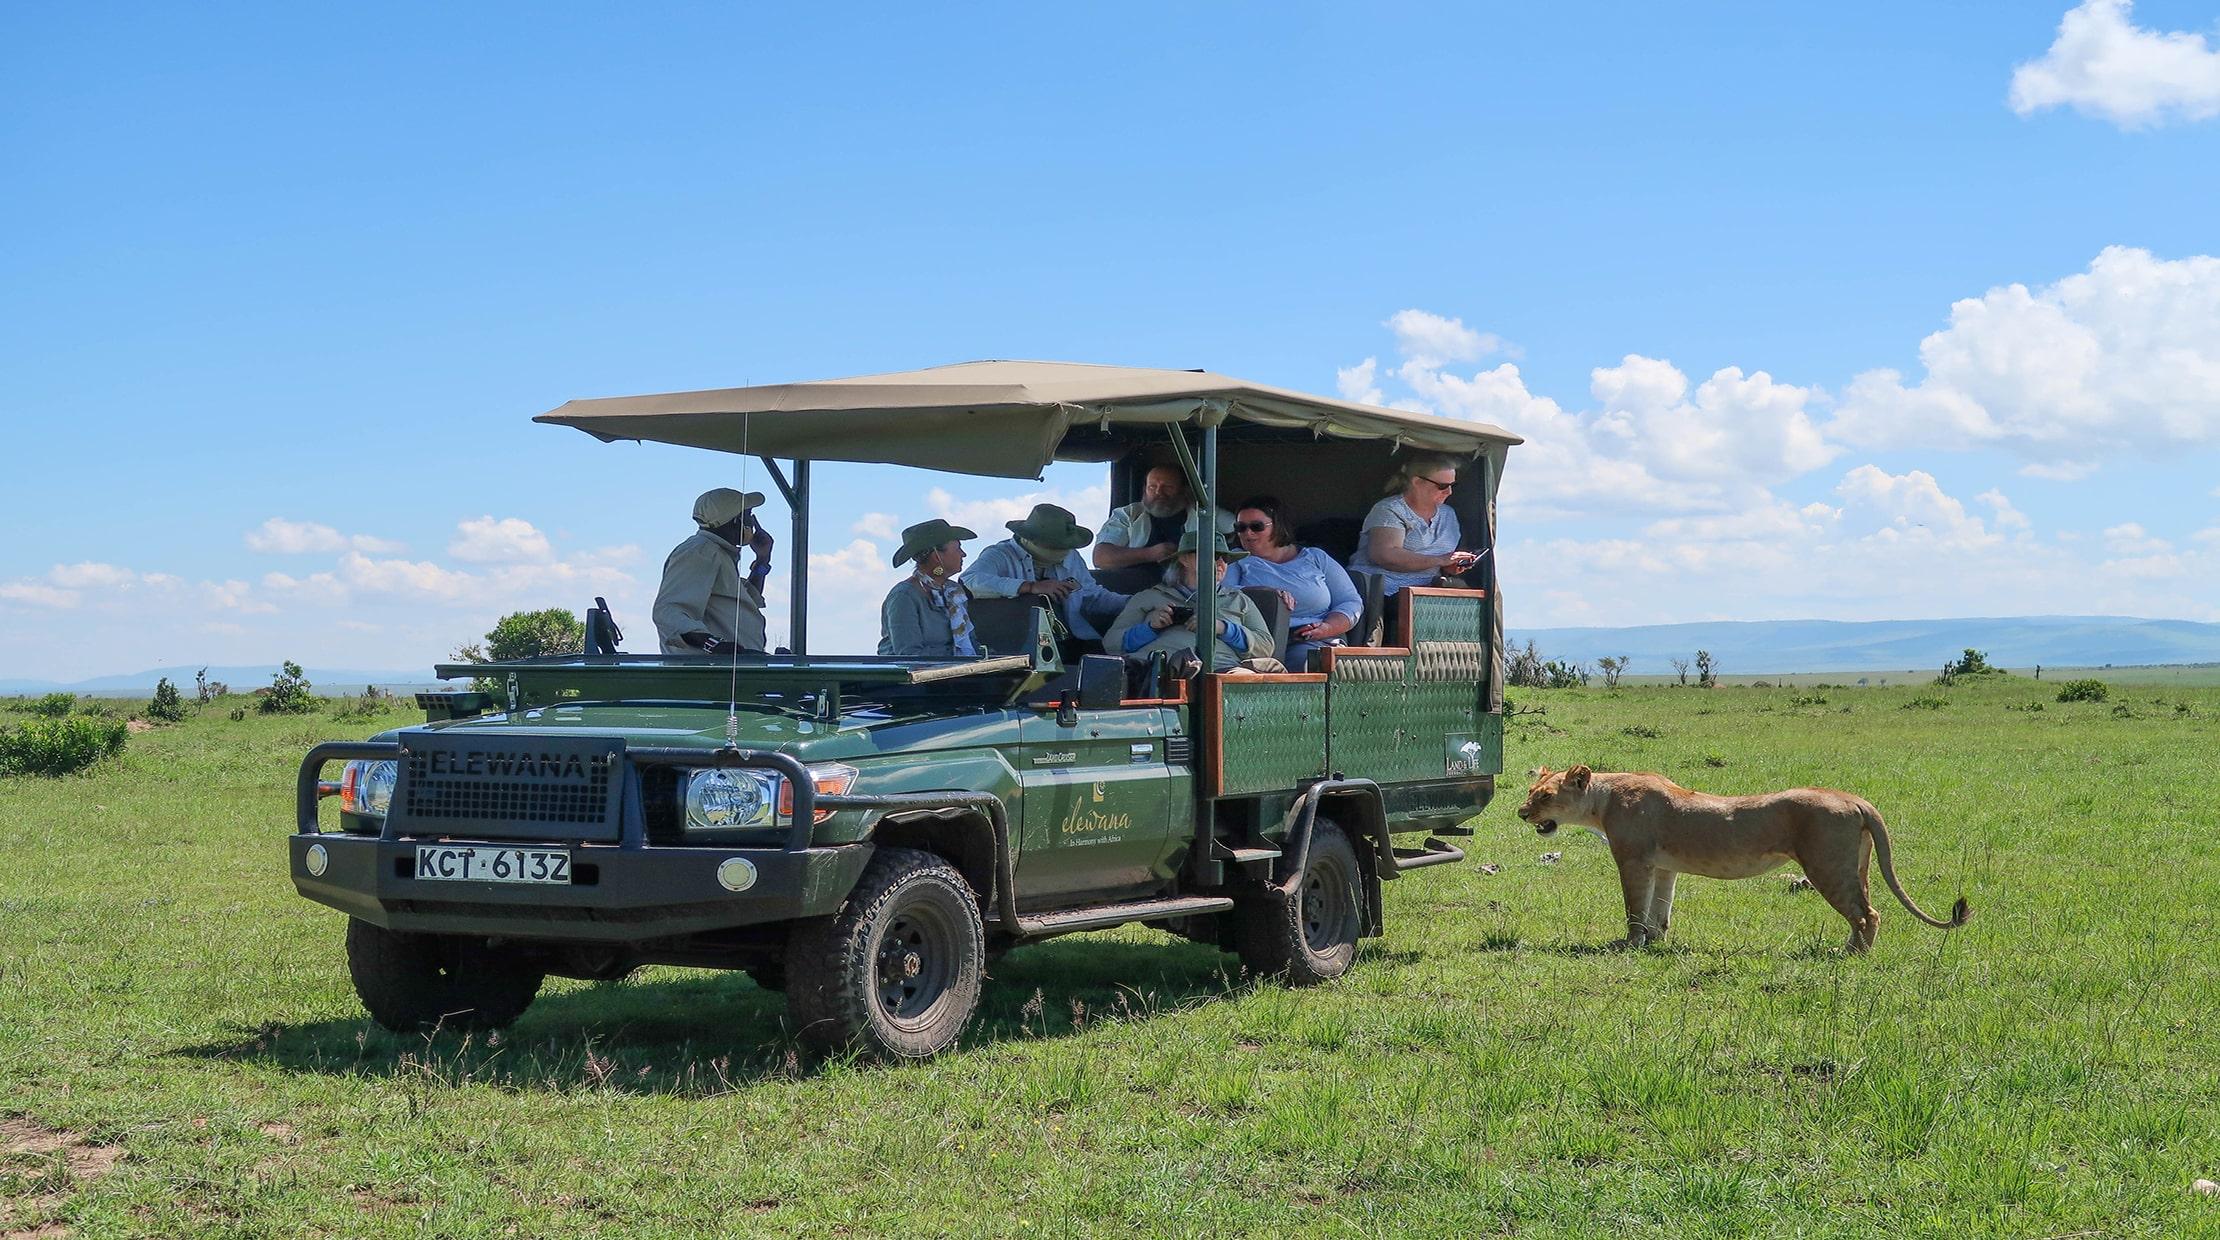 safari vehicle with passengers near lion